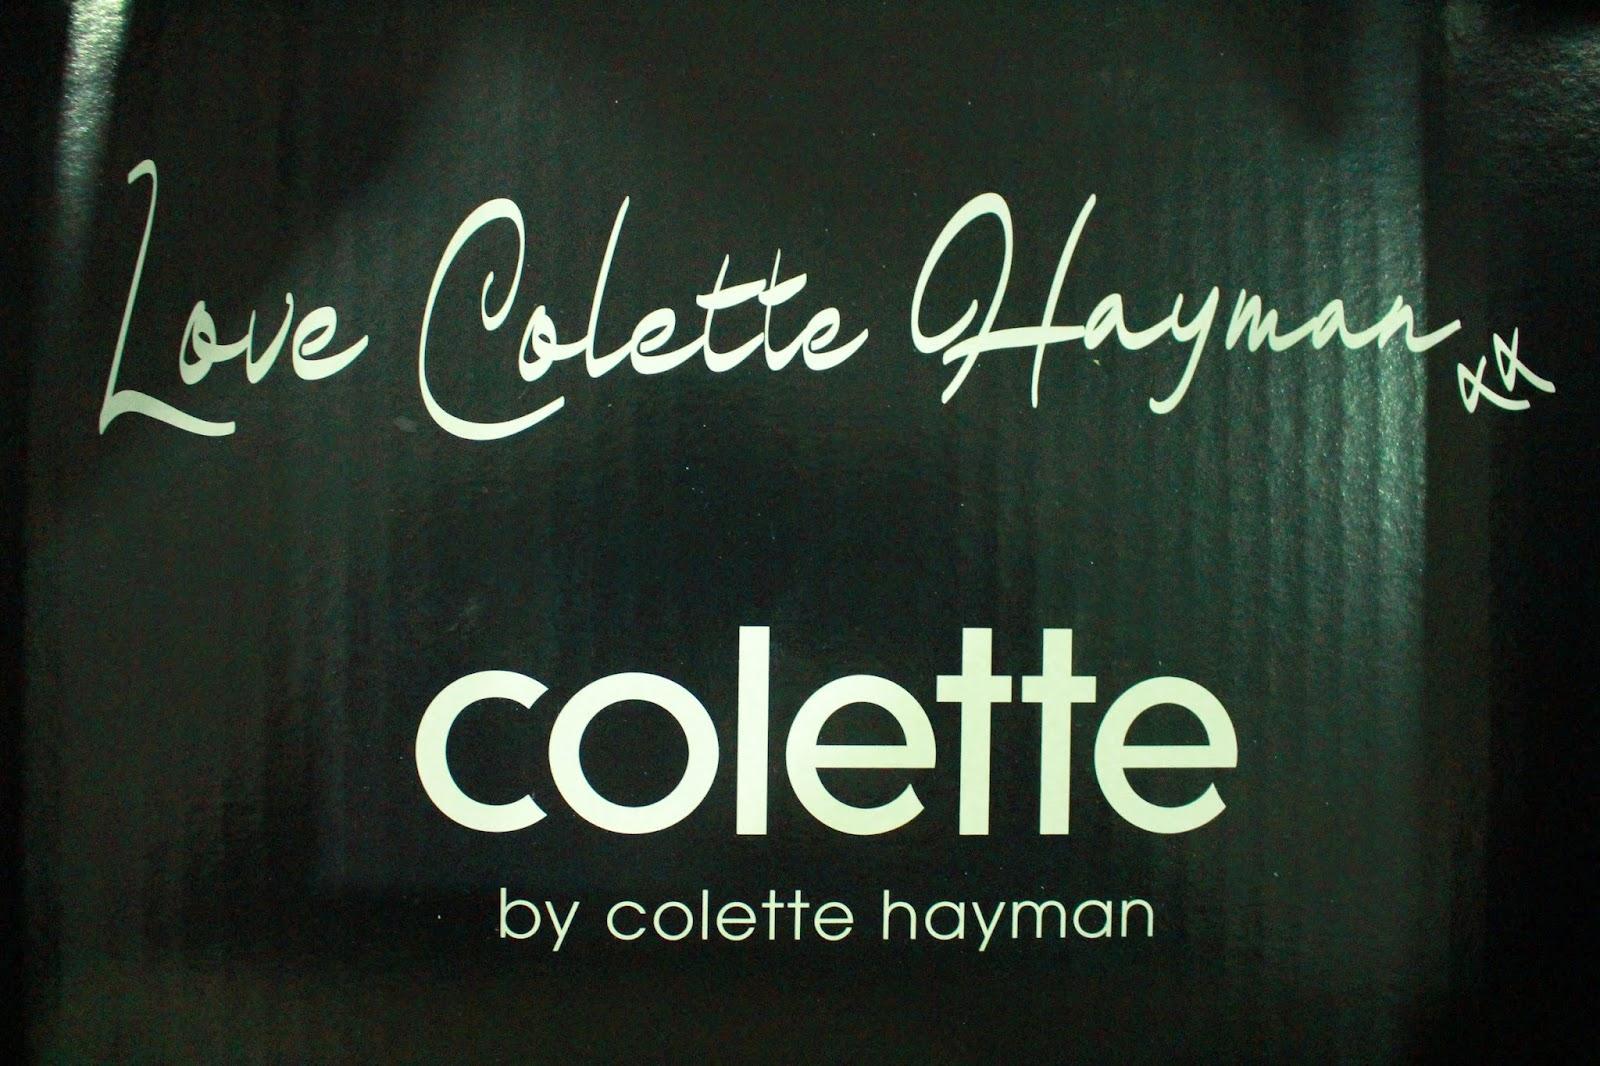 Colette Hayman Online Order/Haul